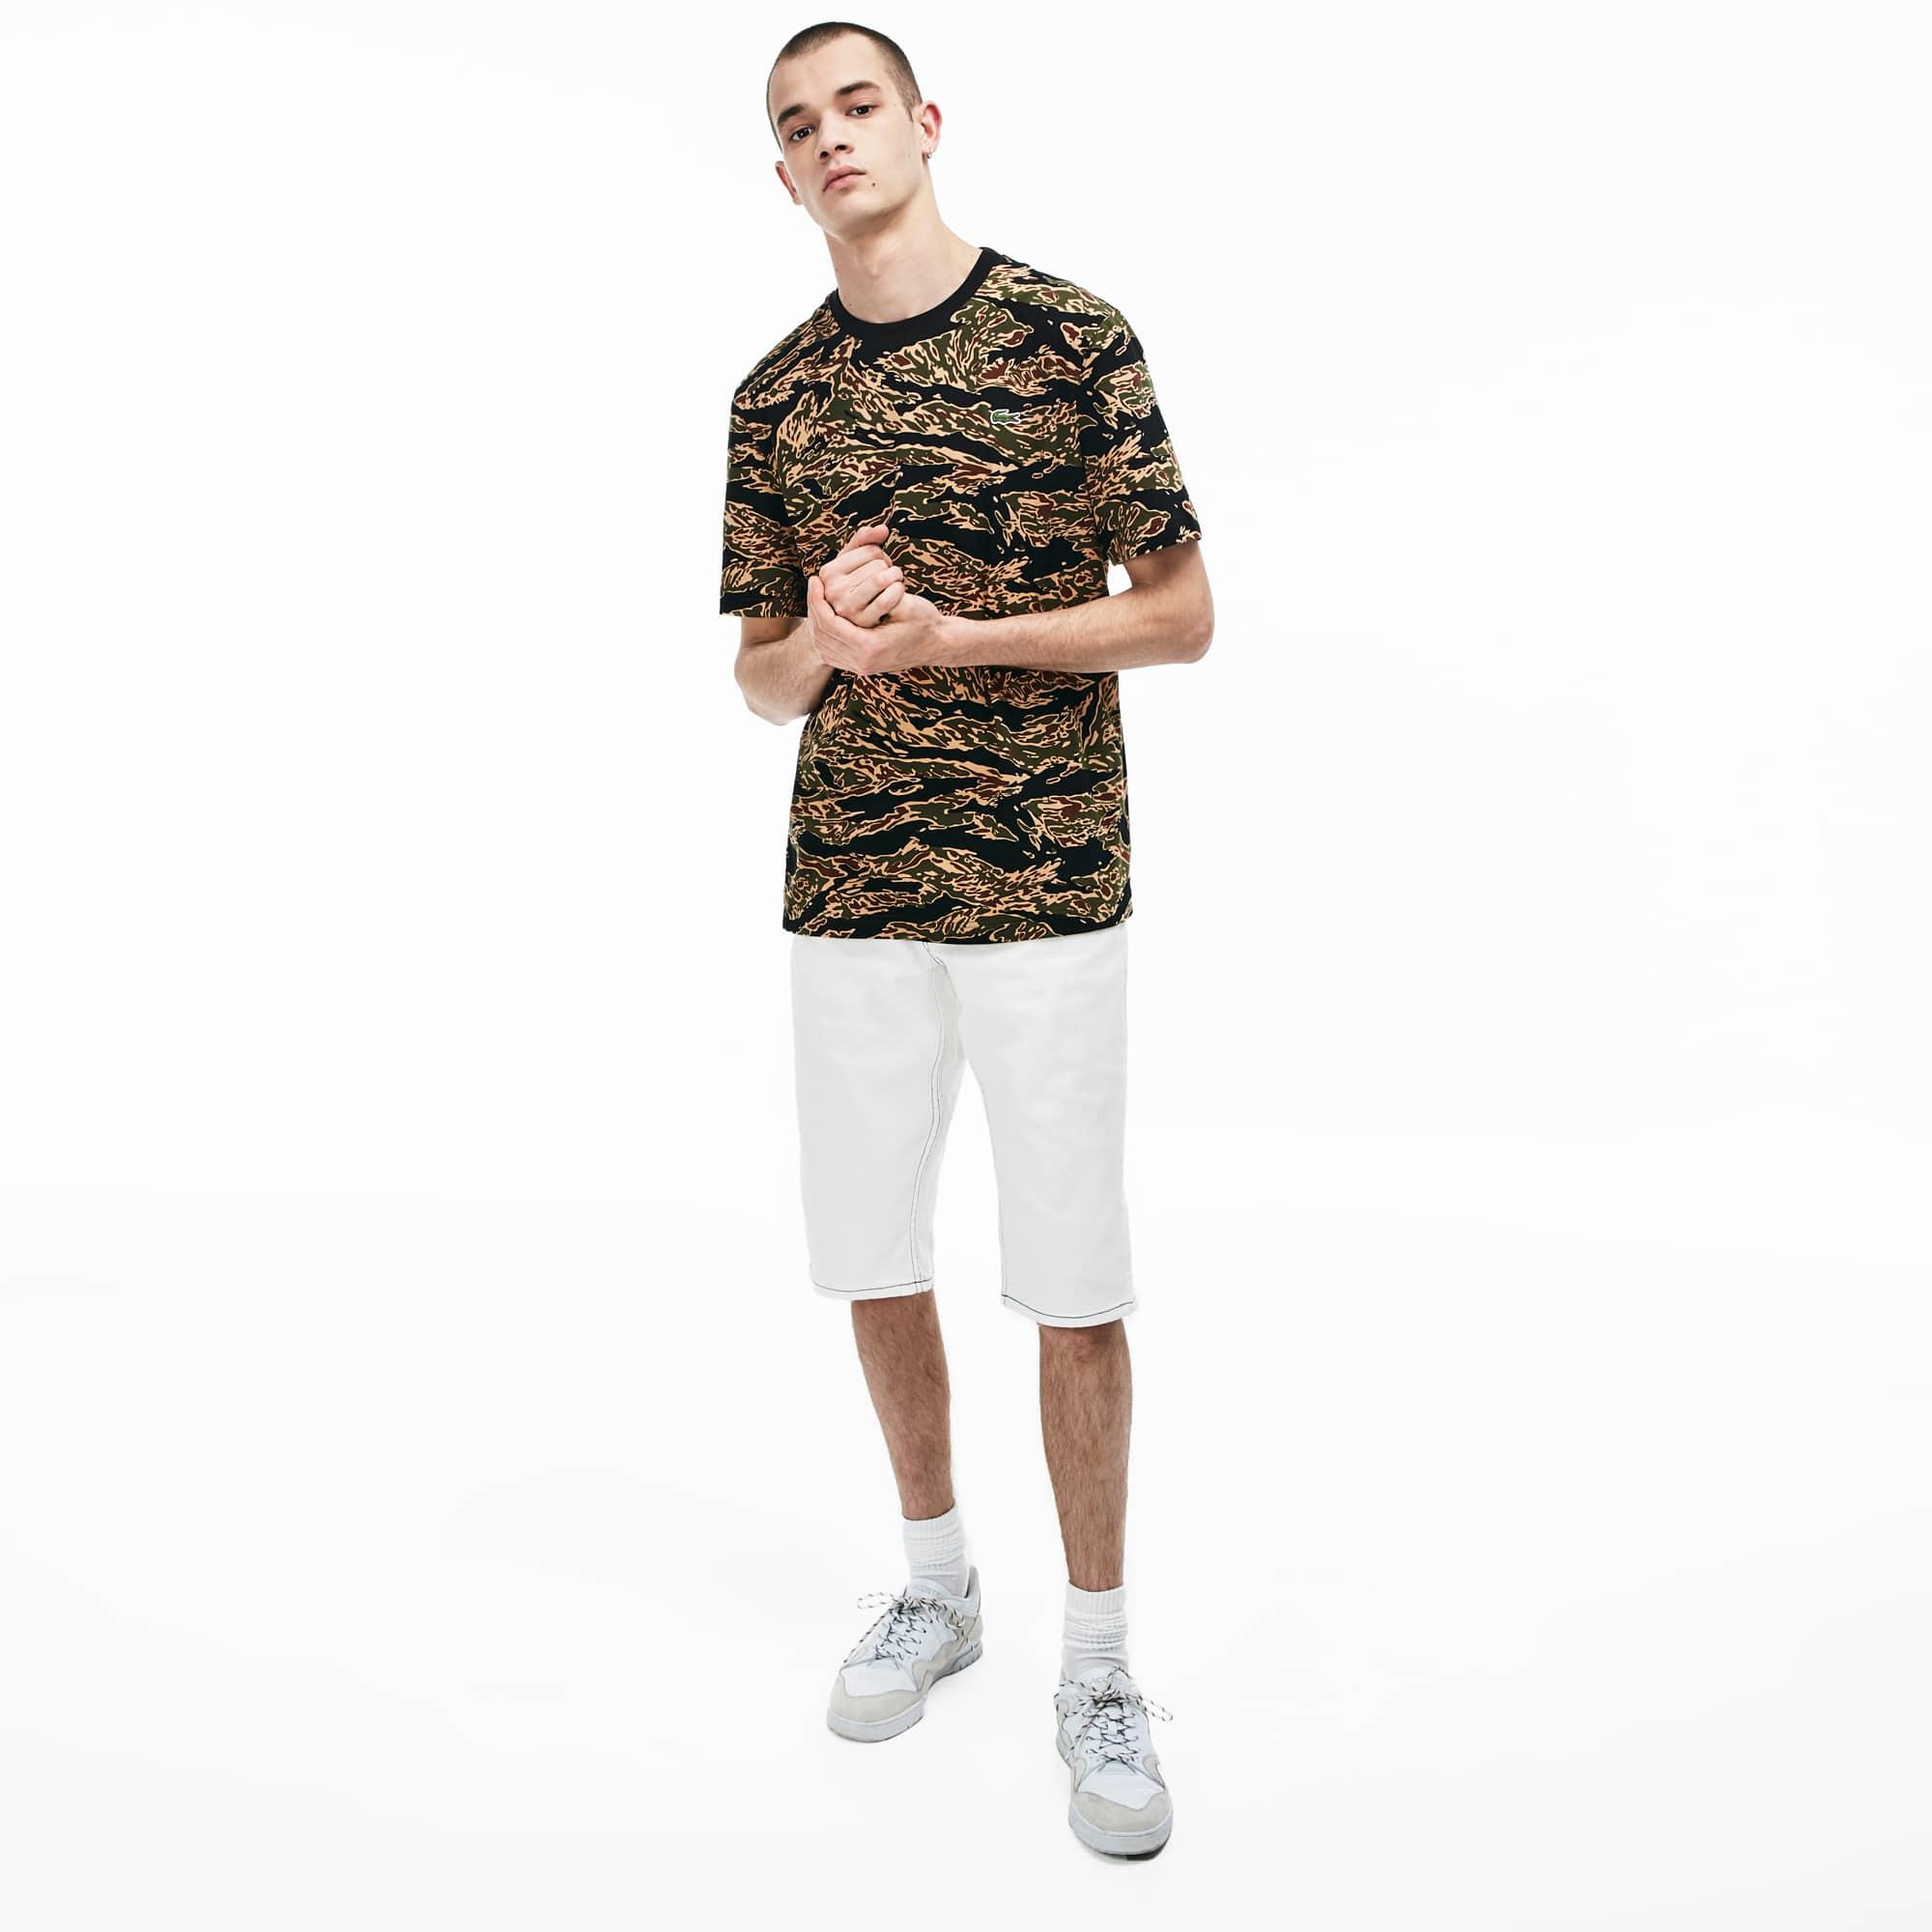 465b21f3f6 Men's LIVE Crew Neck Cotton T-shirt